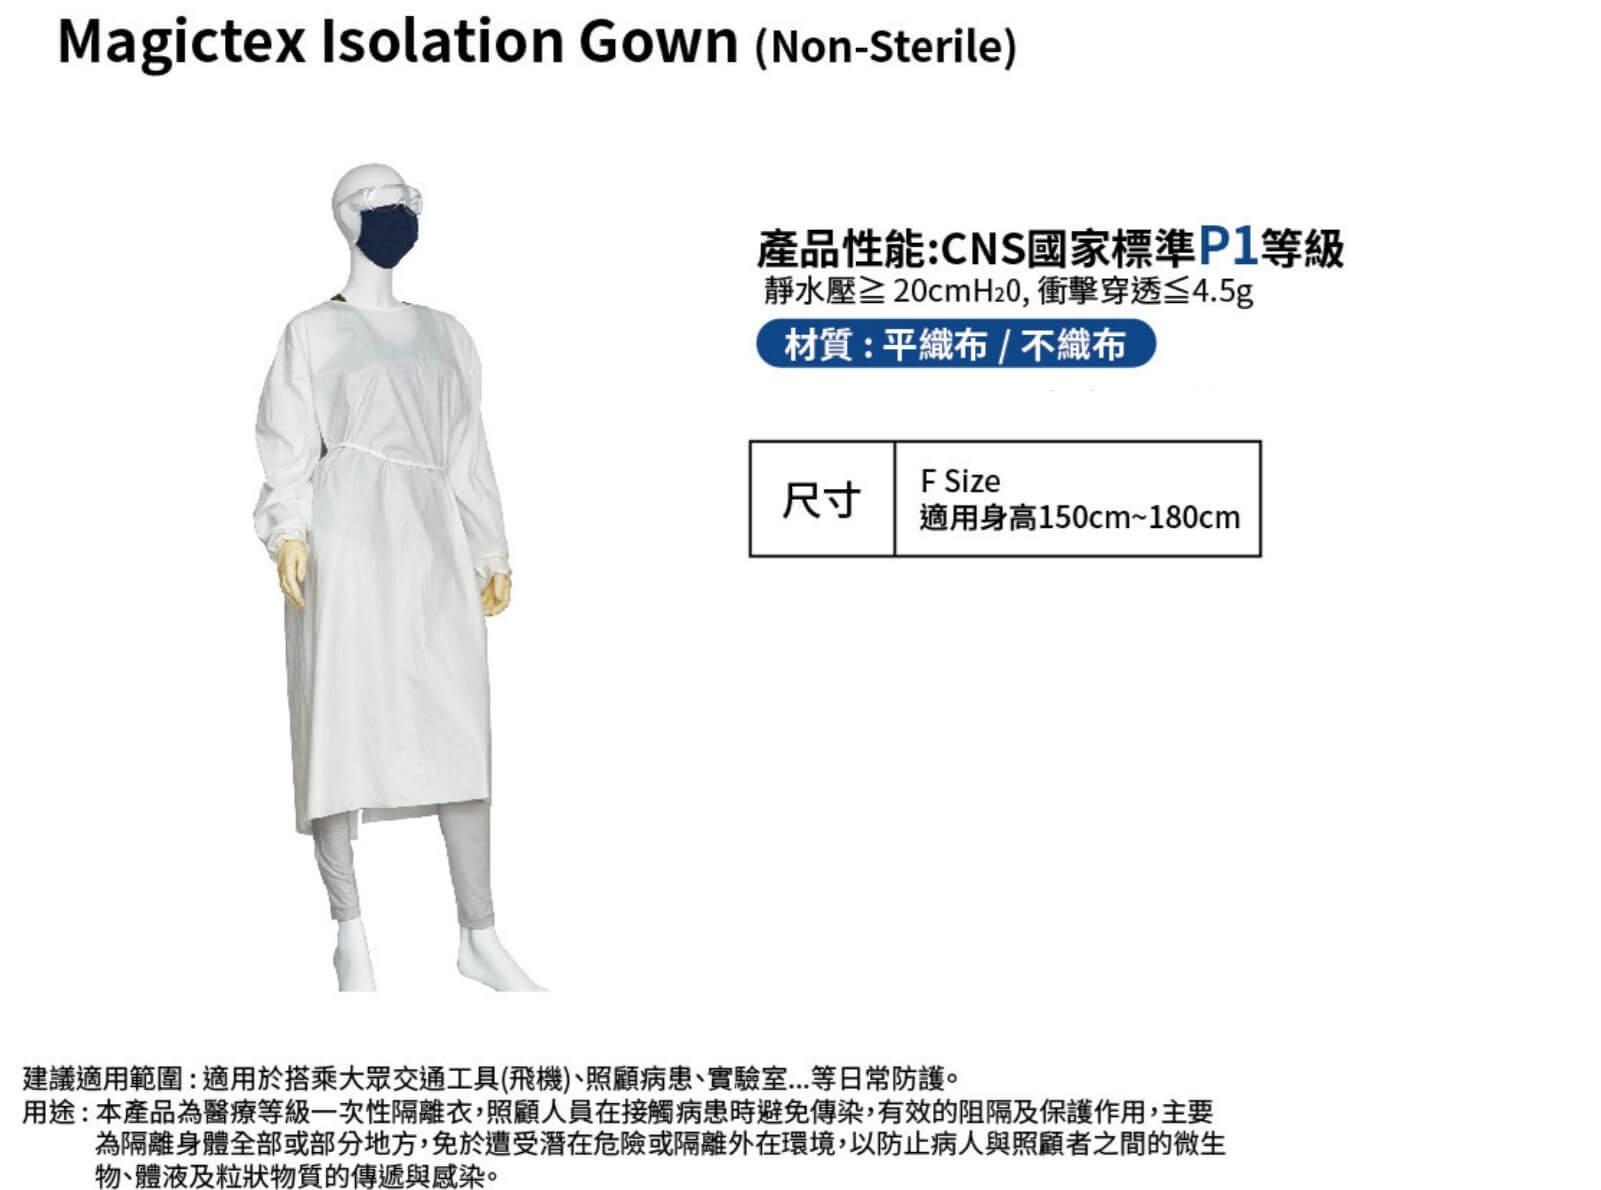 P1 - 醫用標準防護衣 隔離衣-搭機出國、照顧病患、實驗室、日常防護防護衣